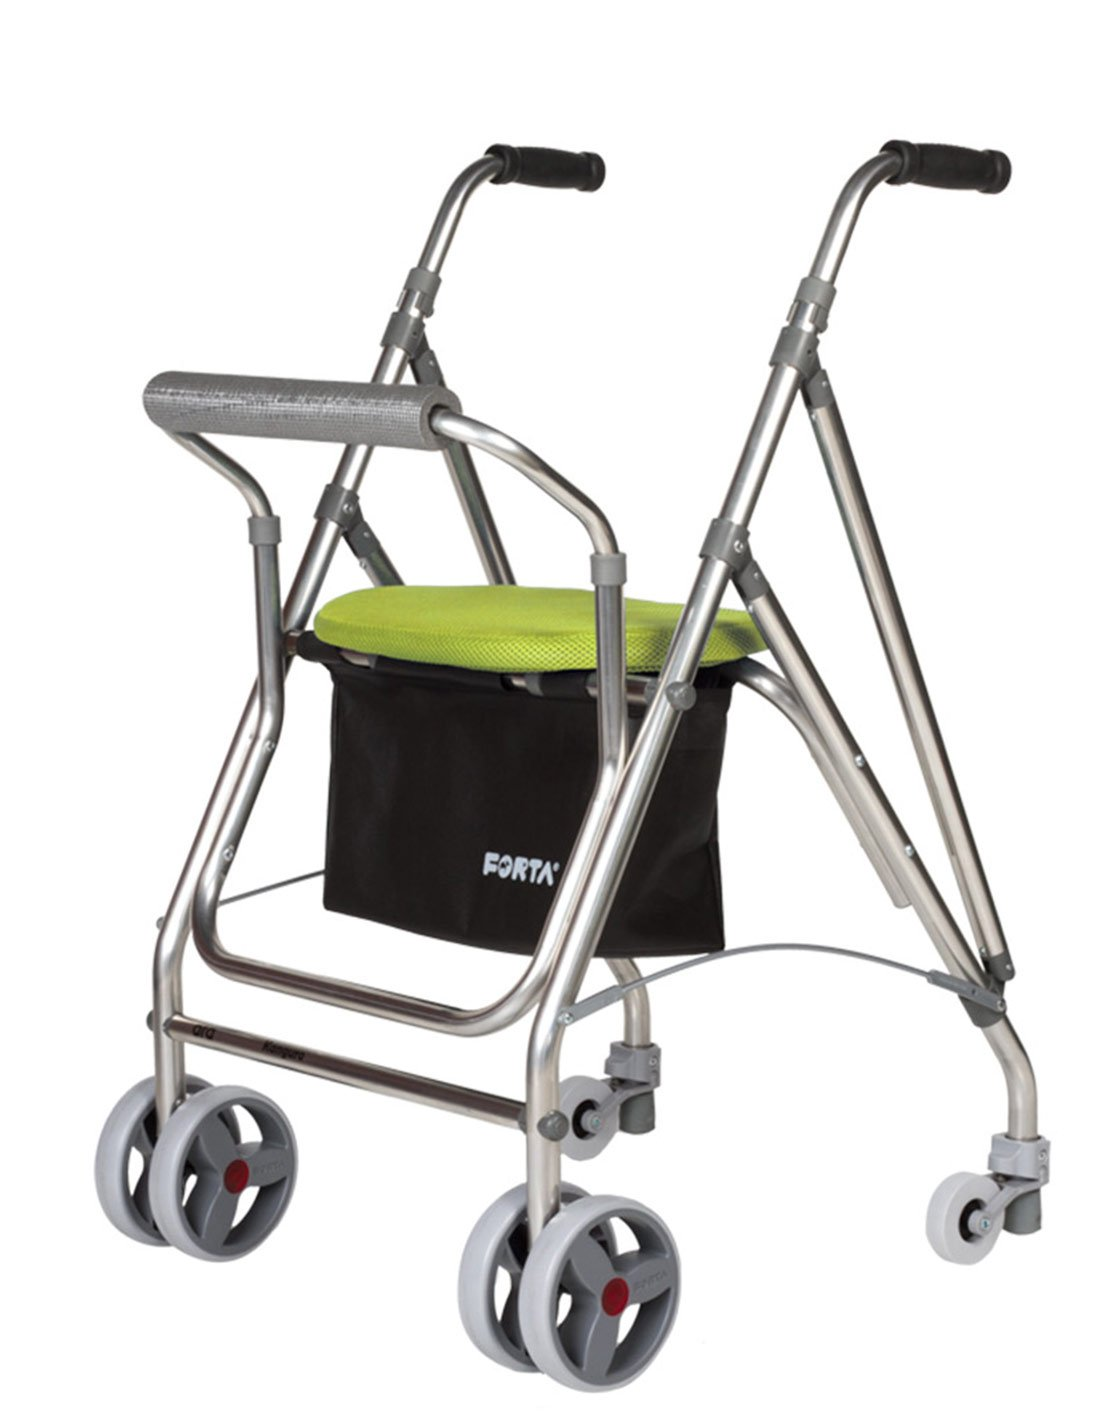 Forta fabricaciones - Andador de 4 ruedas para ancianos Kanguro ...